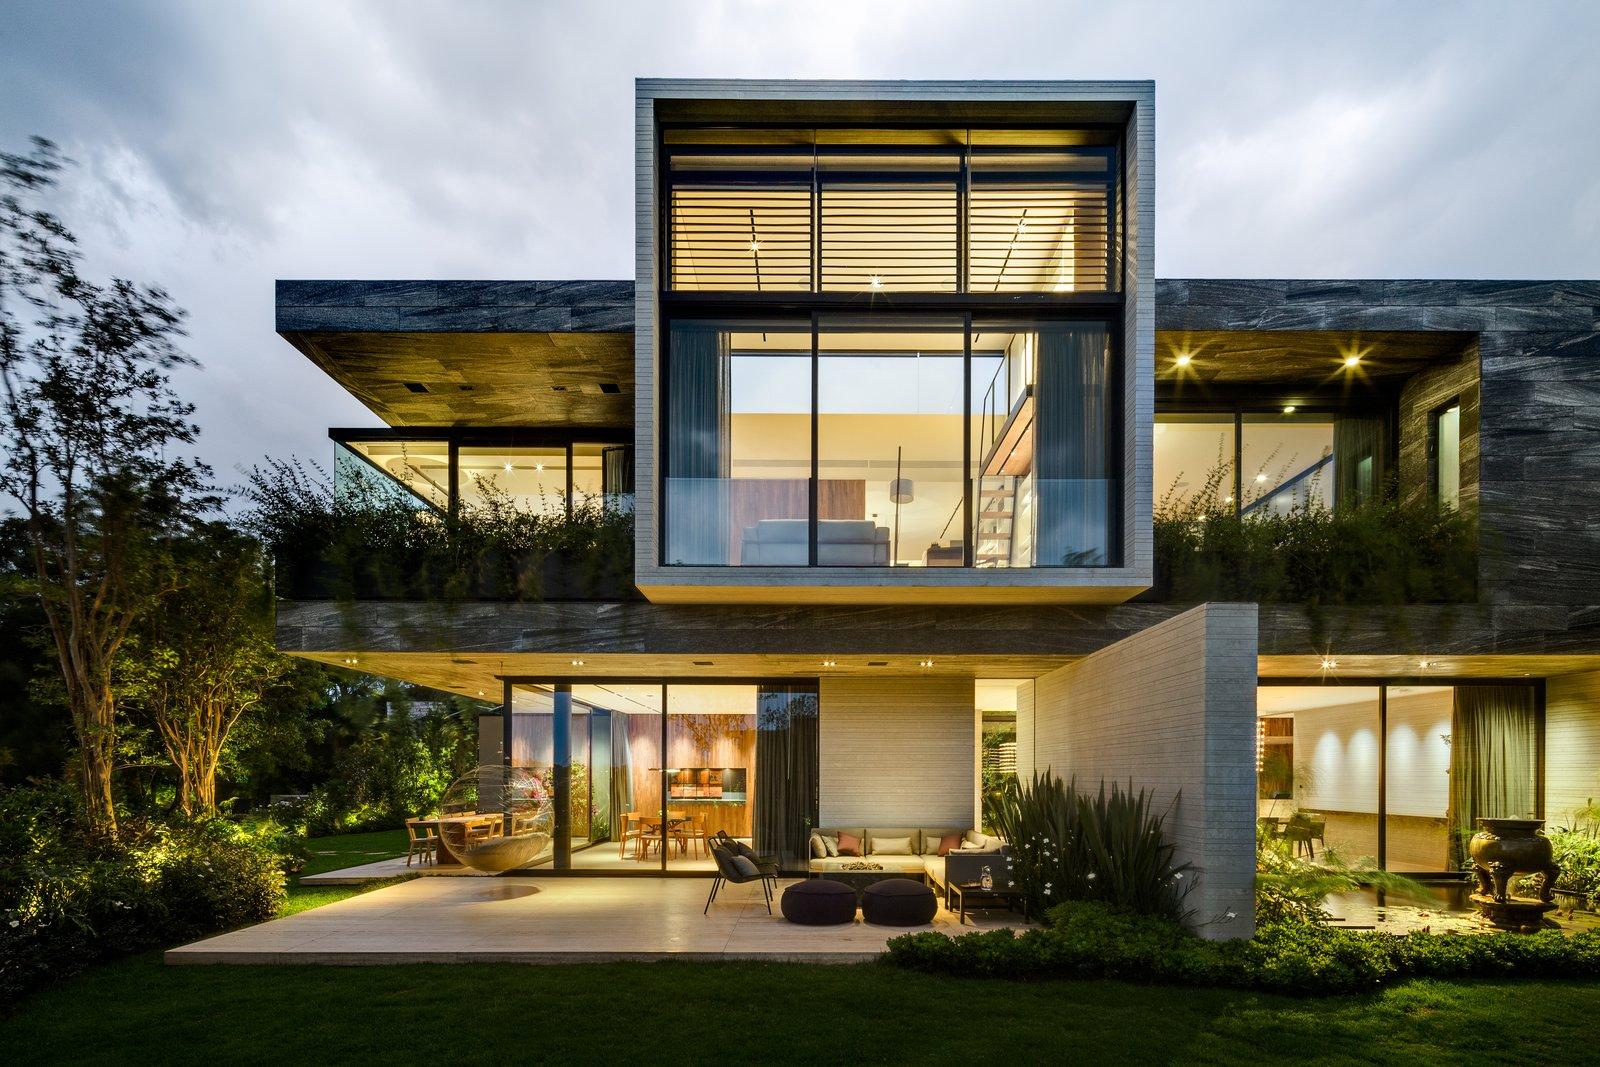 Tagged: Exterior, House, and Concrete Siding Material.  Casa O Cuatro by Migdal Arquitectos